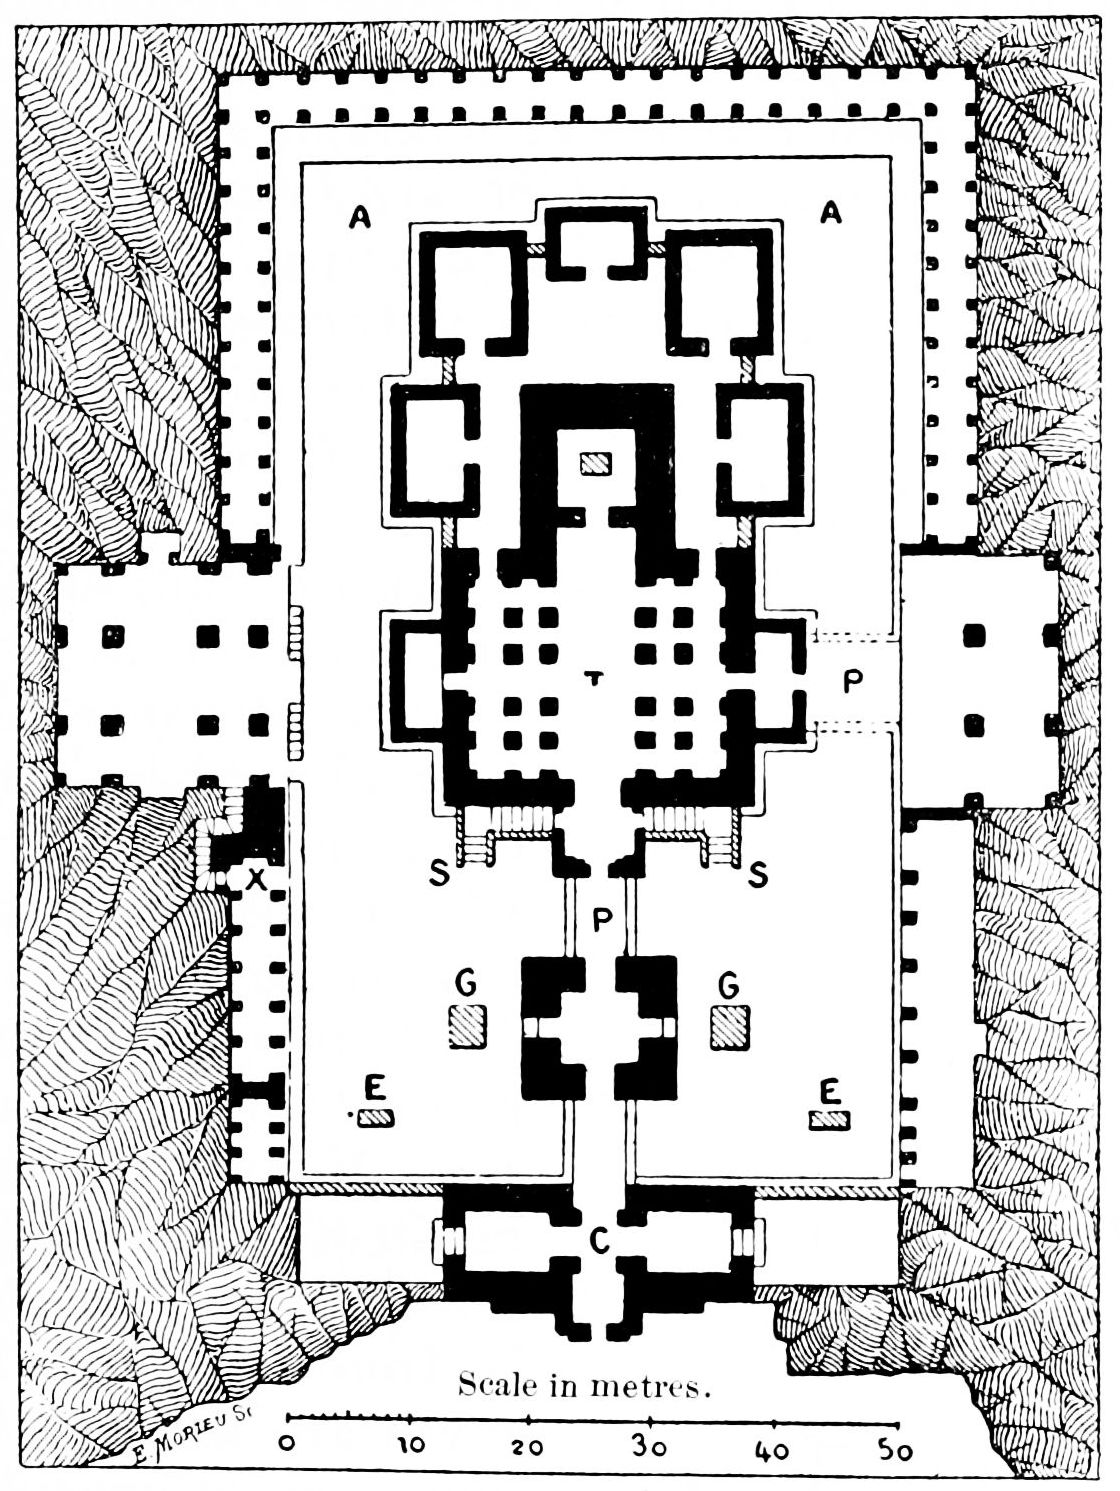 file psm v41 d043 plan of the temples at kylas jpg wikimedia commons file psm v41 d043 plan of the temples at kylas jpg